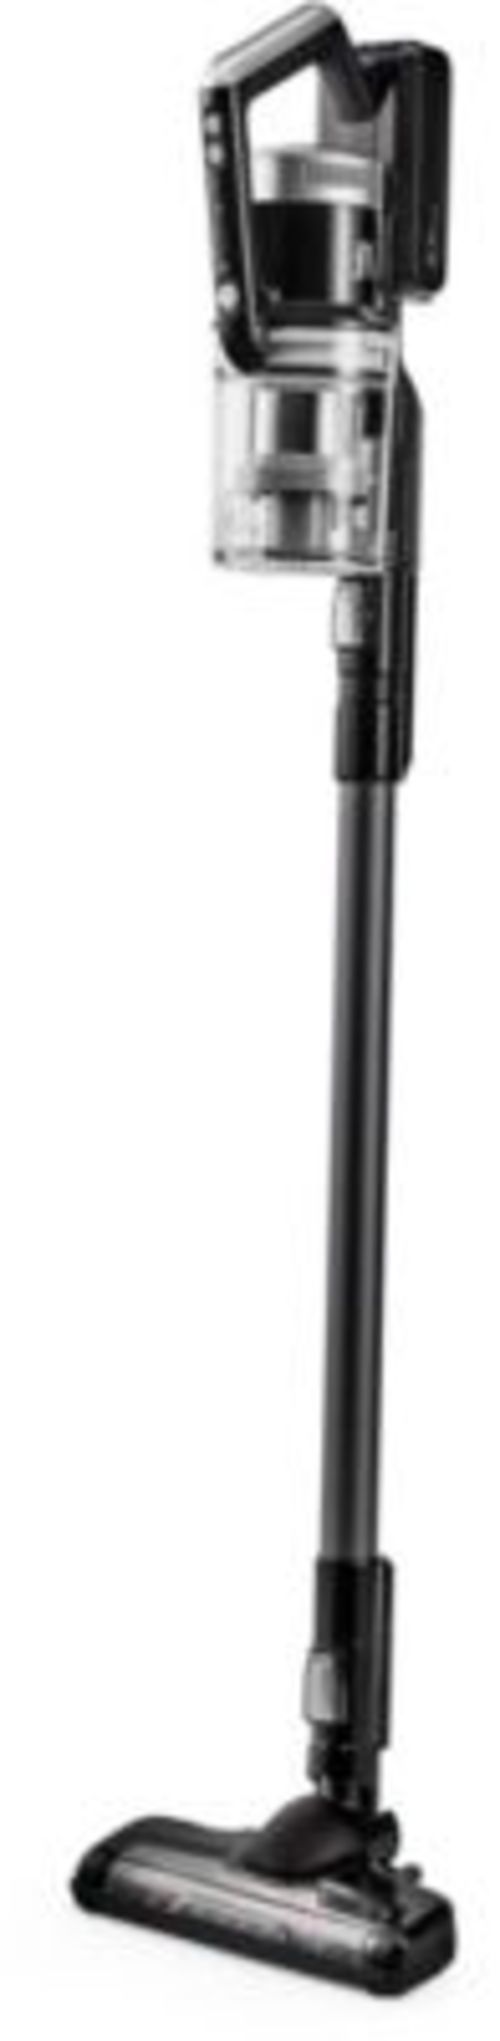 Aspirateur balai - Beko VRT70925VB Sans sac 0,7 L Noir, Argent